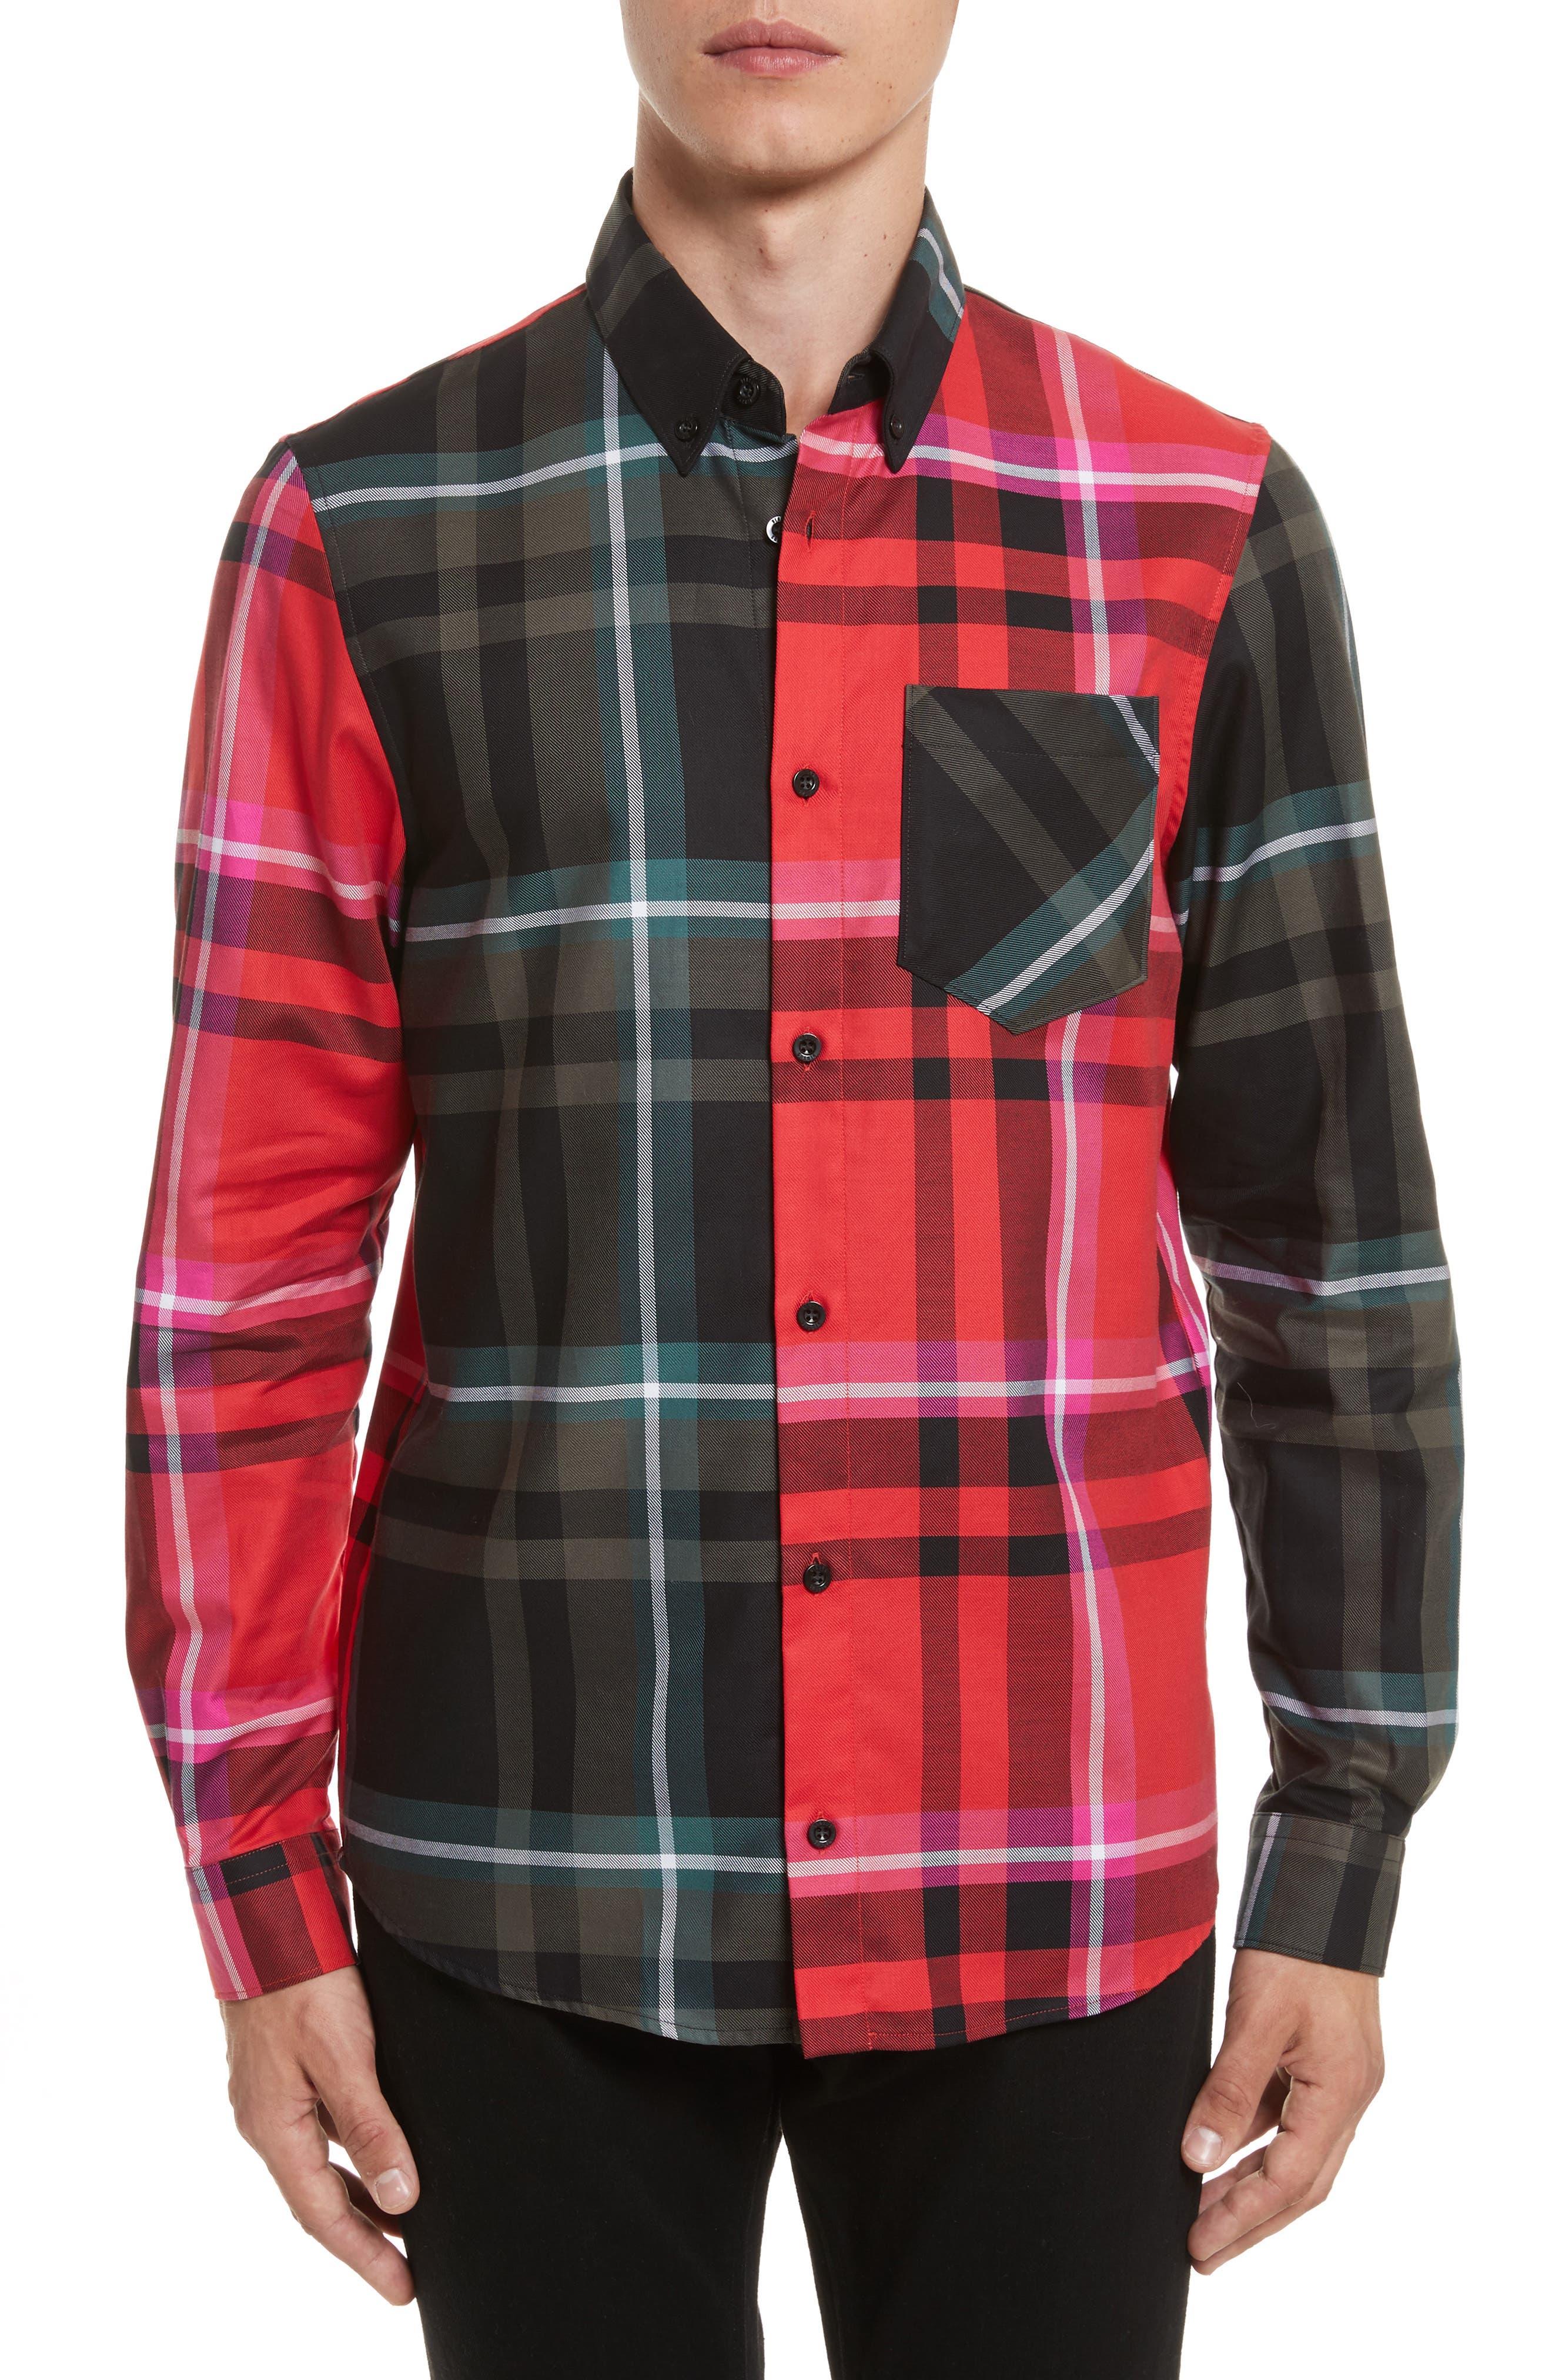 VERSUS by Versace Plaid Woven Shirt,                         Main,                         color, 647